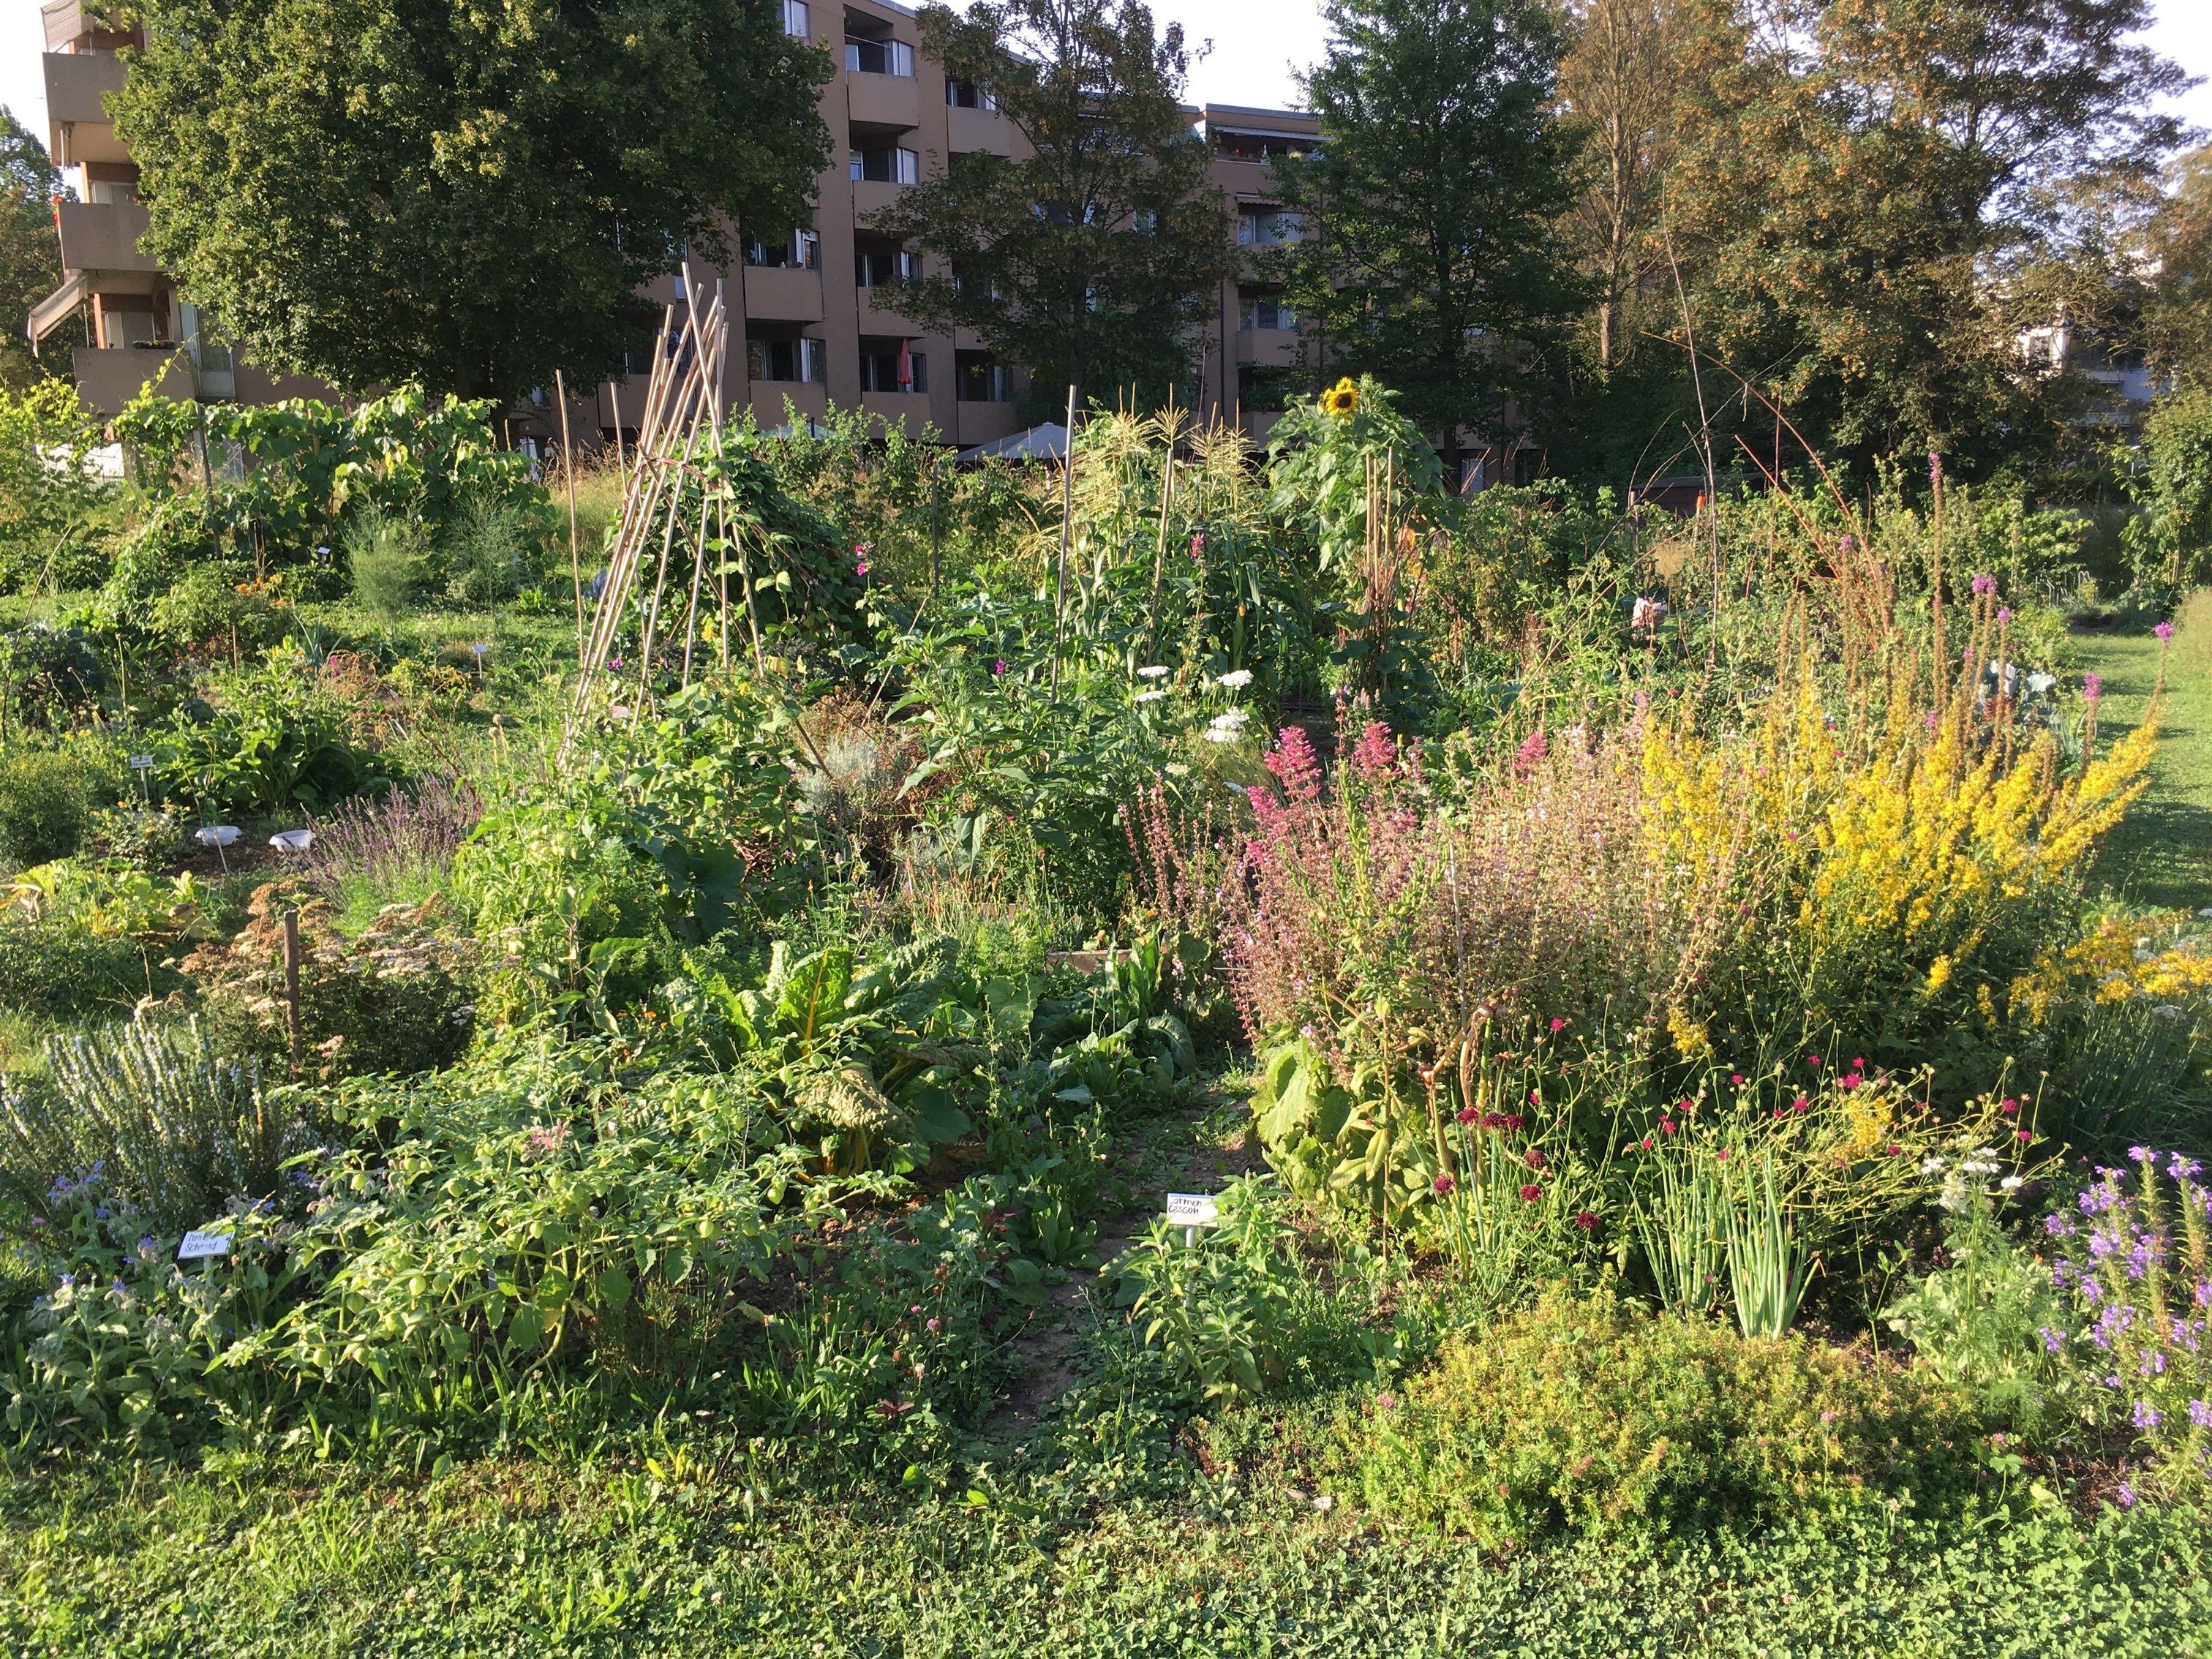 2020-08-13 Ogif Garten 4